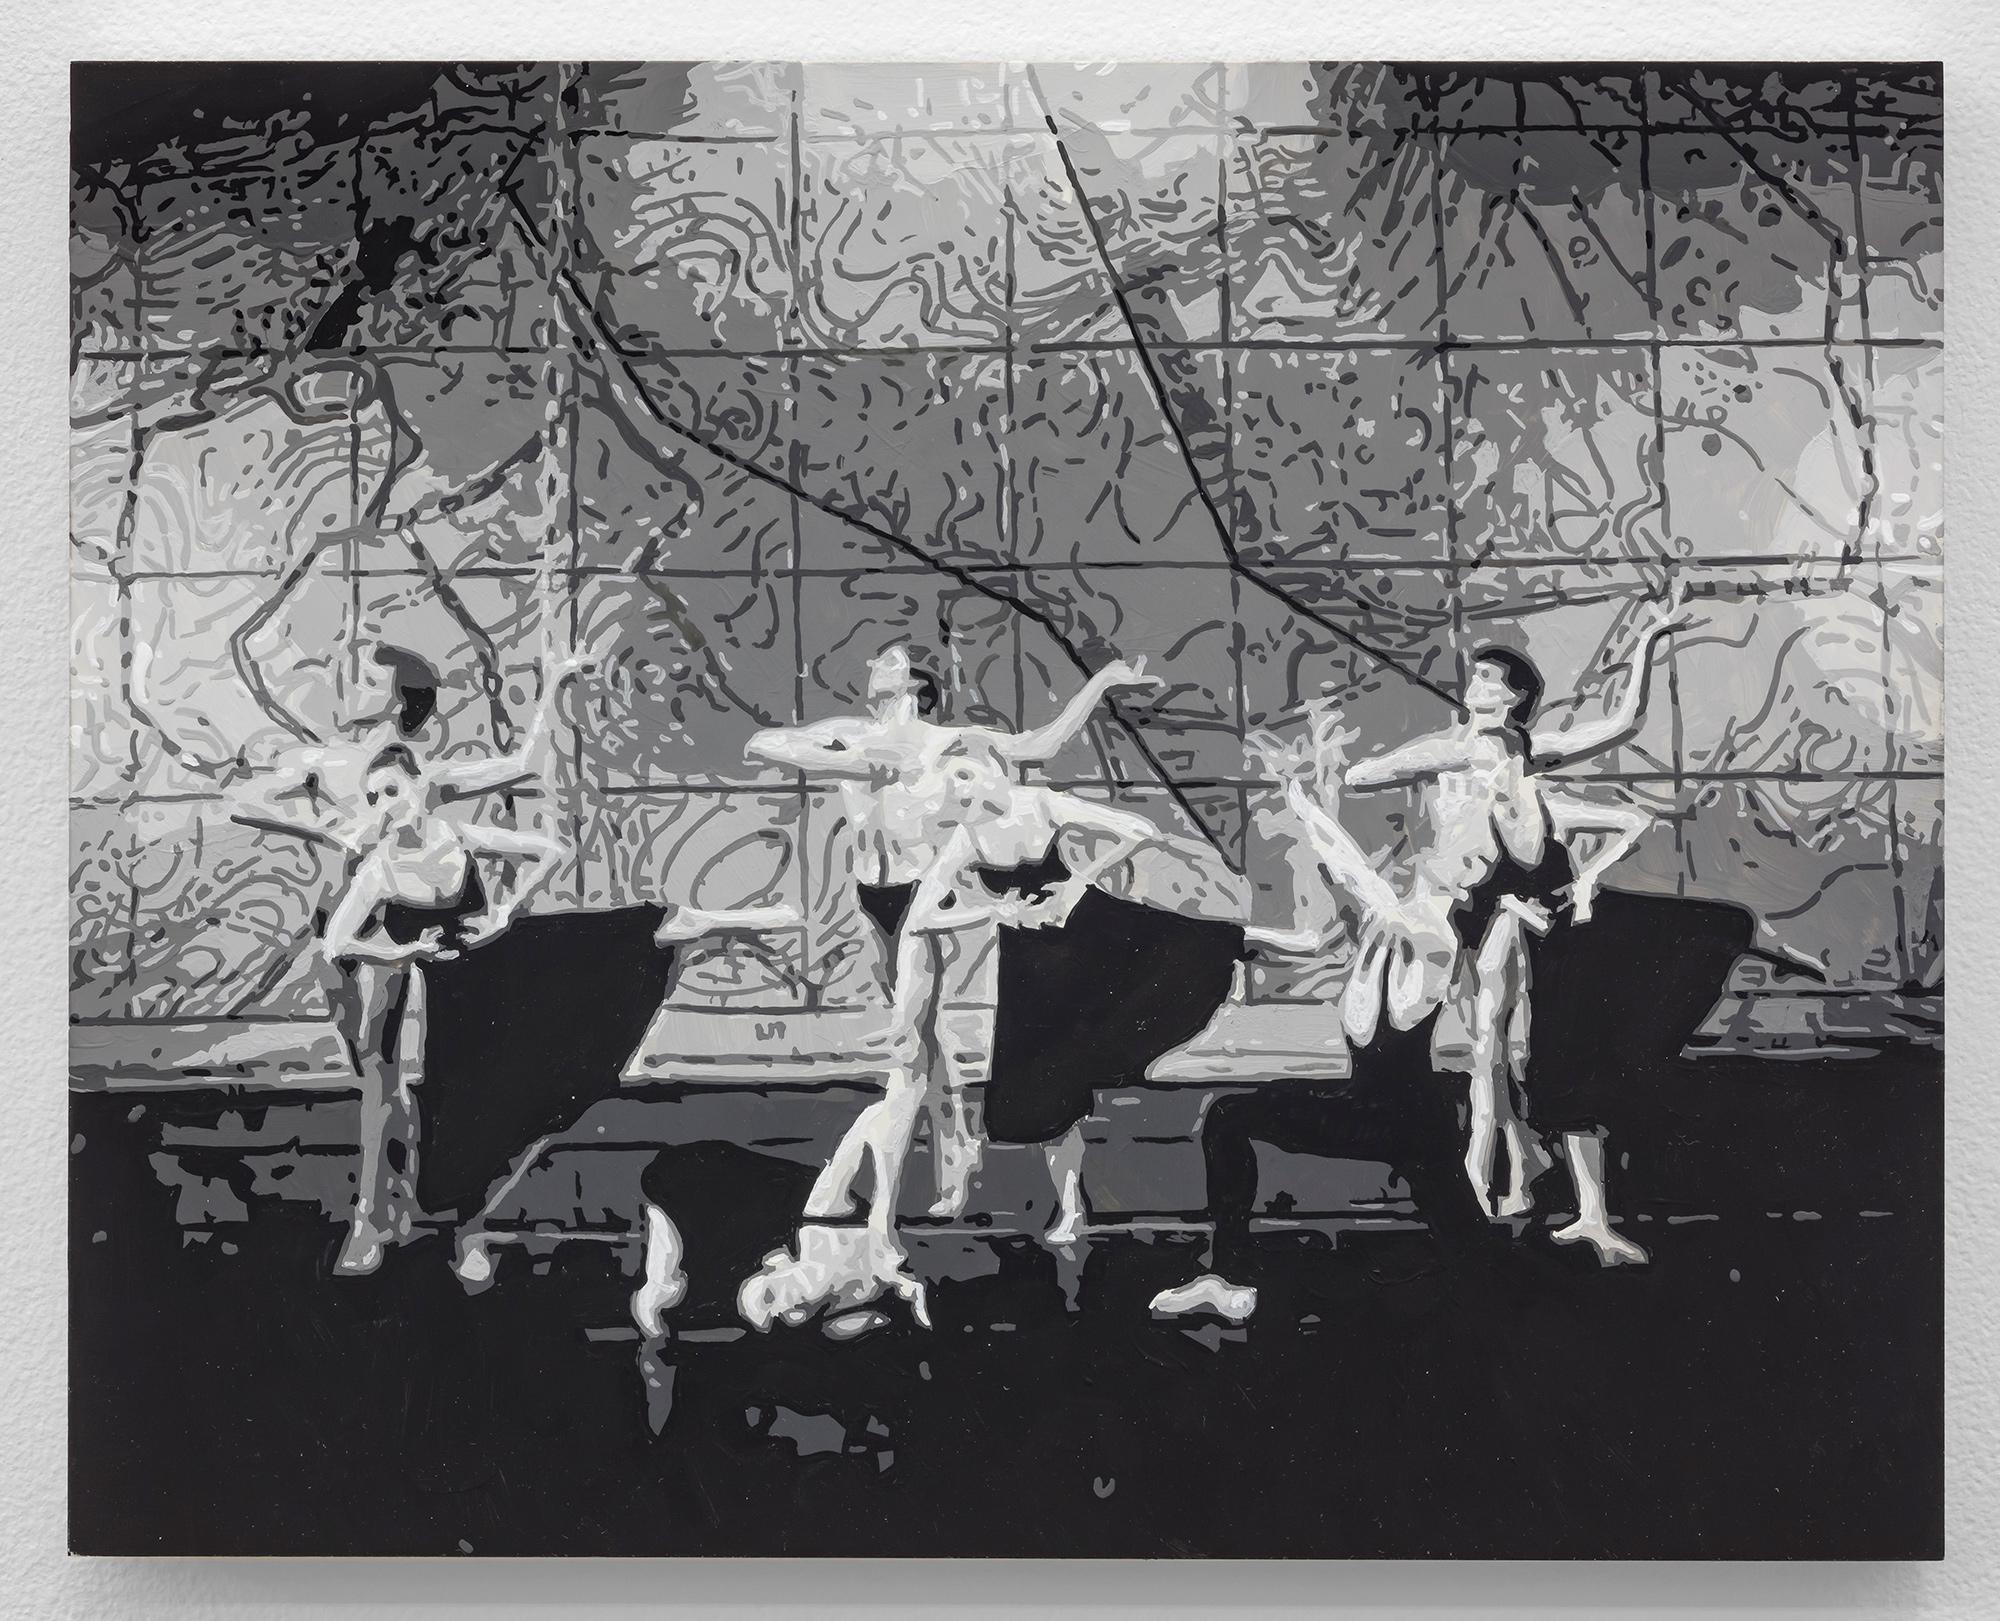 Dorian FitzGerald,  Bat-Dor Dance Company, Joyce Theatre, New York, 1983,  2019, holbein acryla gouache on board, 8 x 10 inches